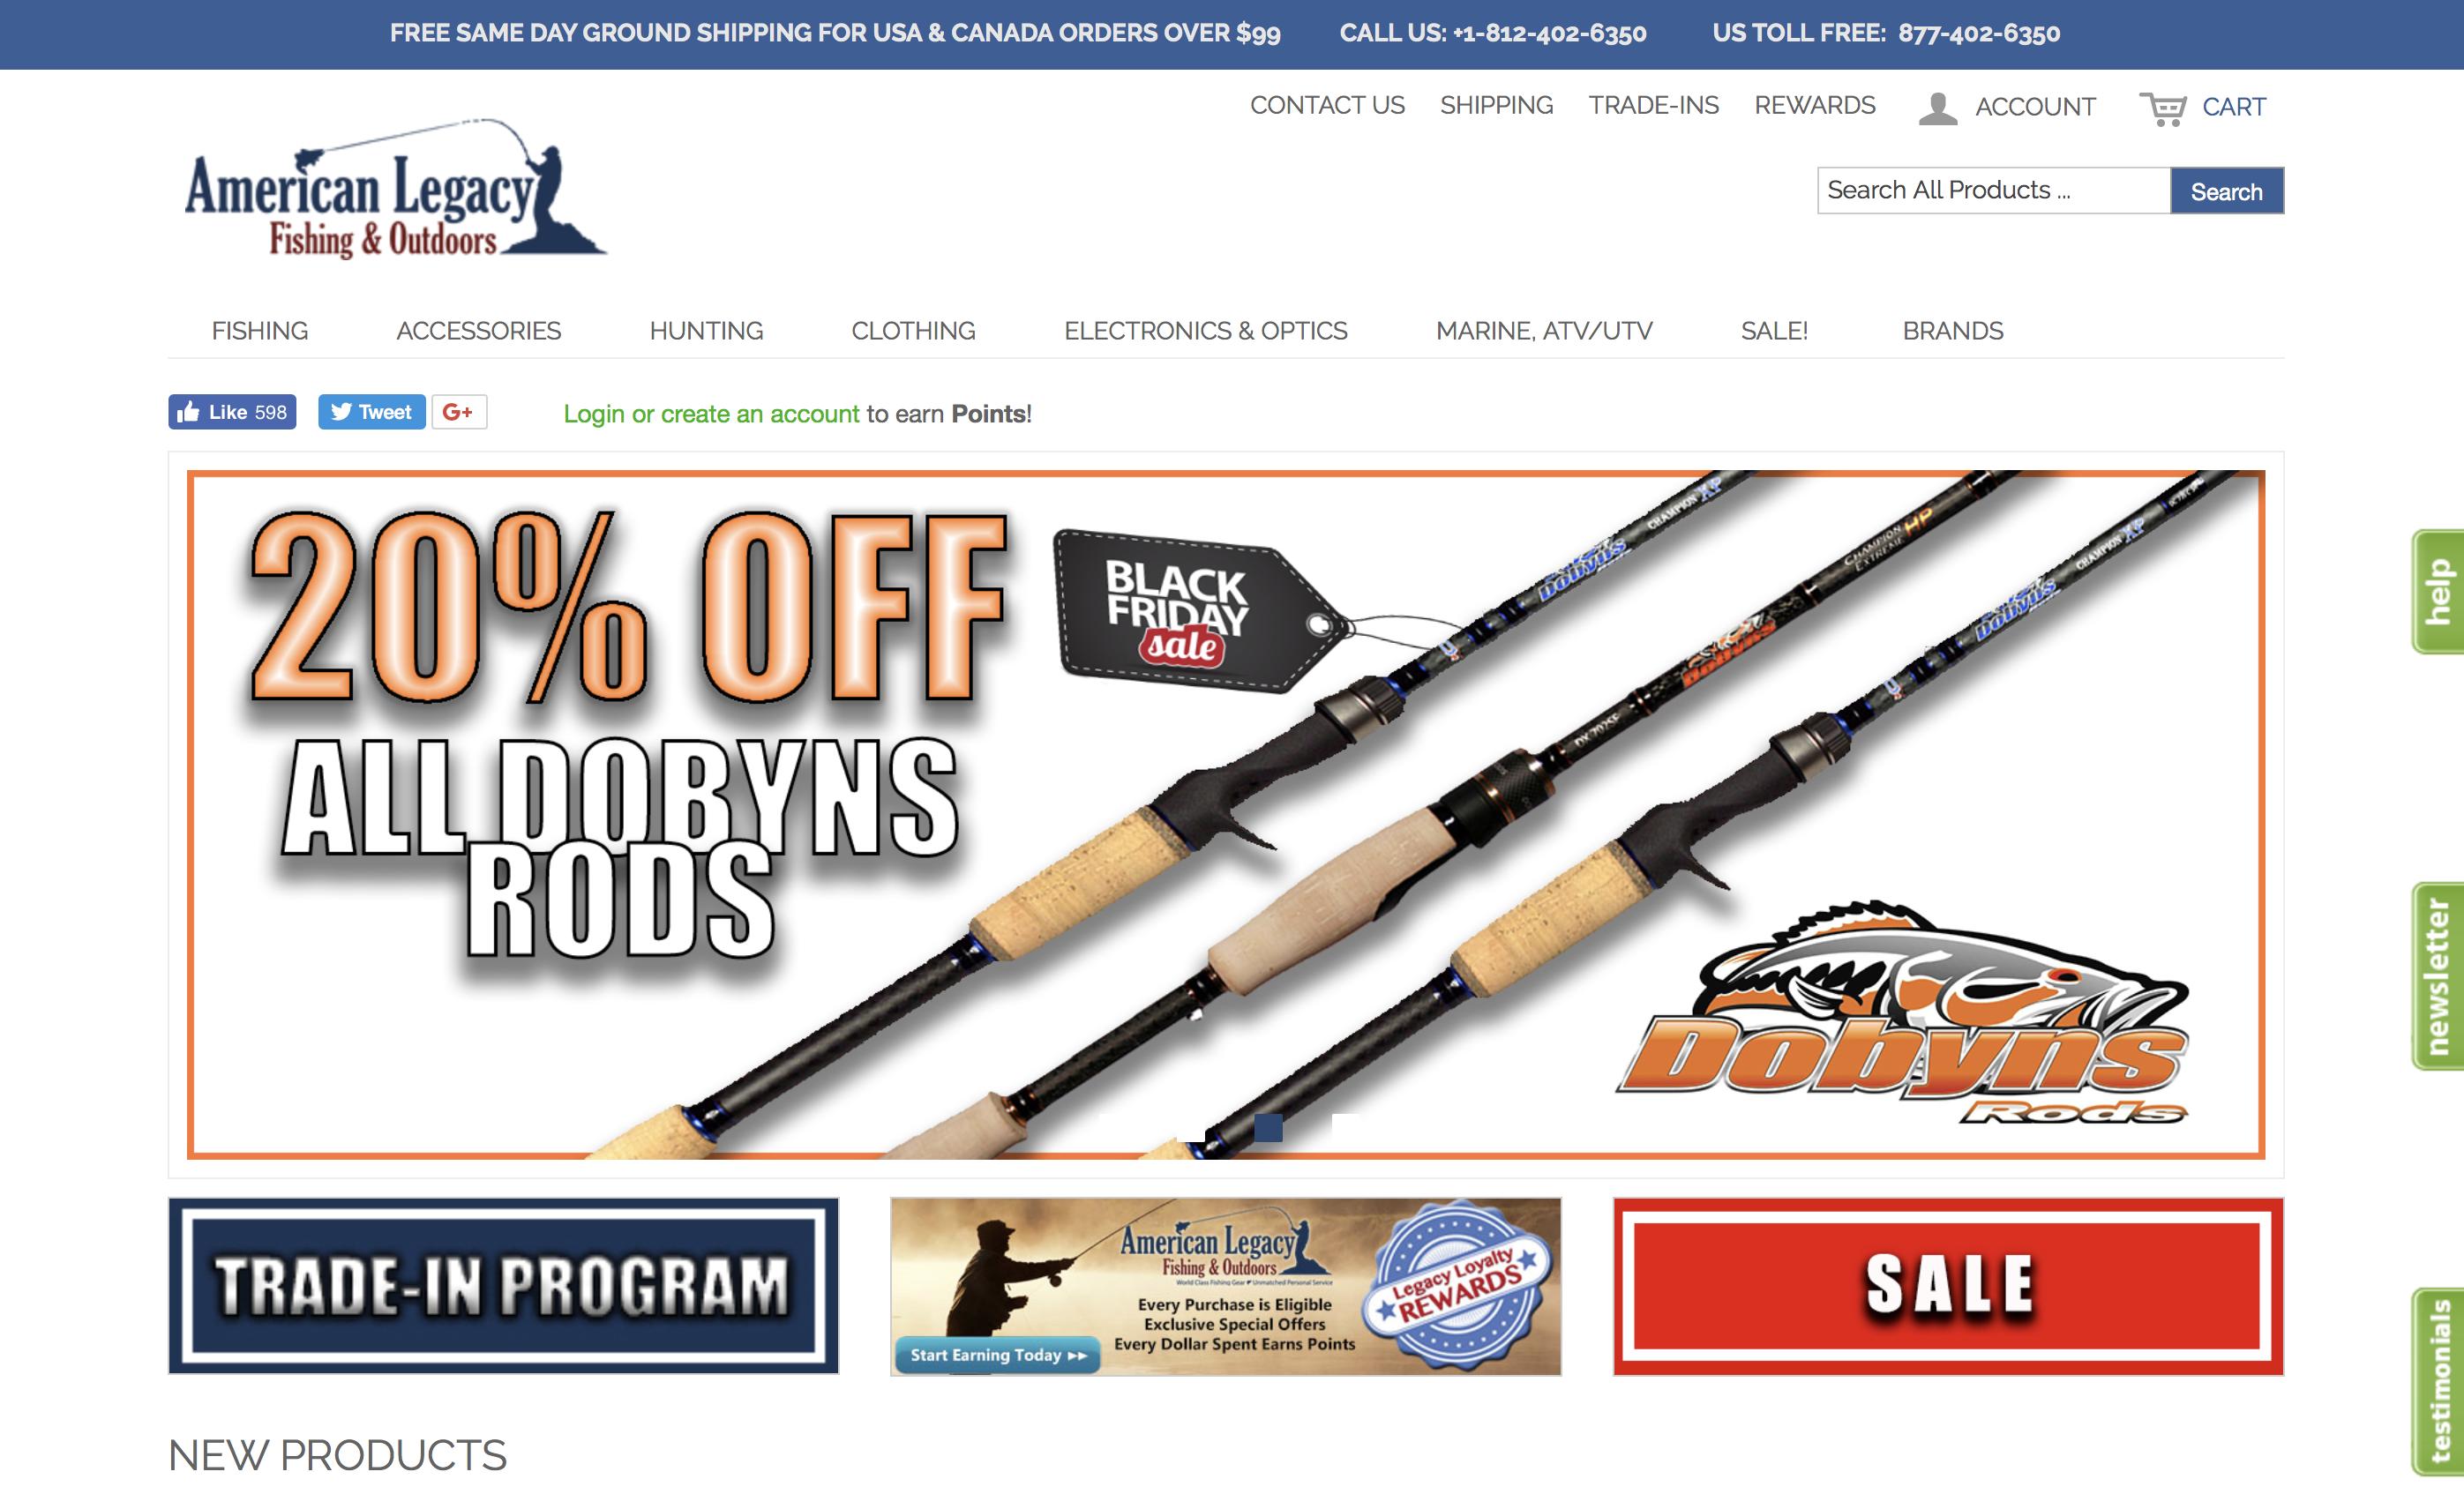 American Legacy Fishing & Outdoors